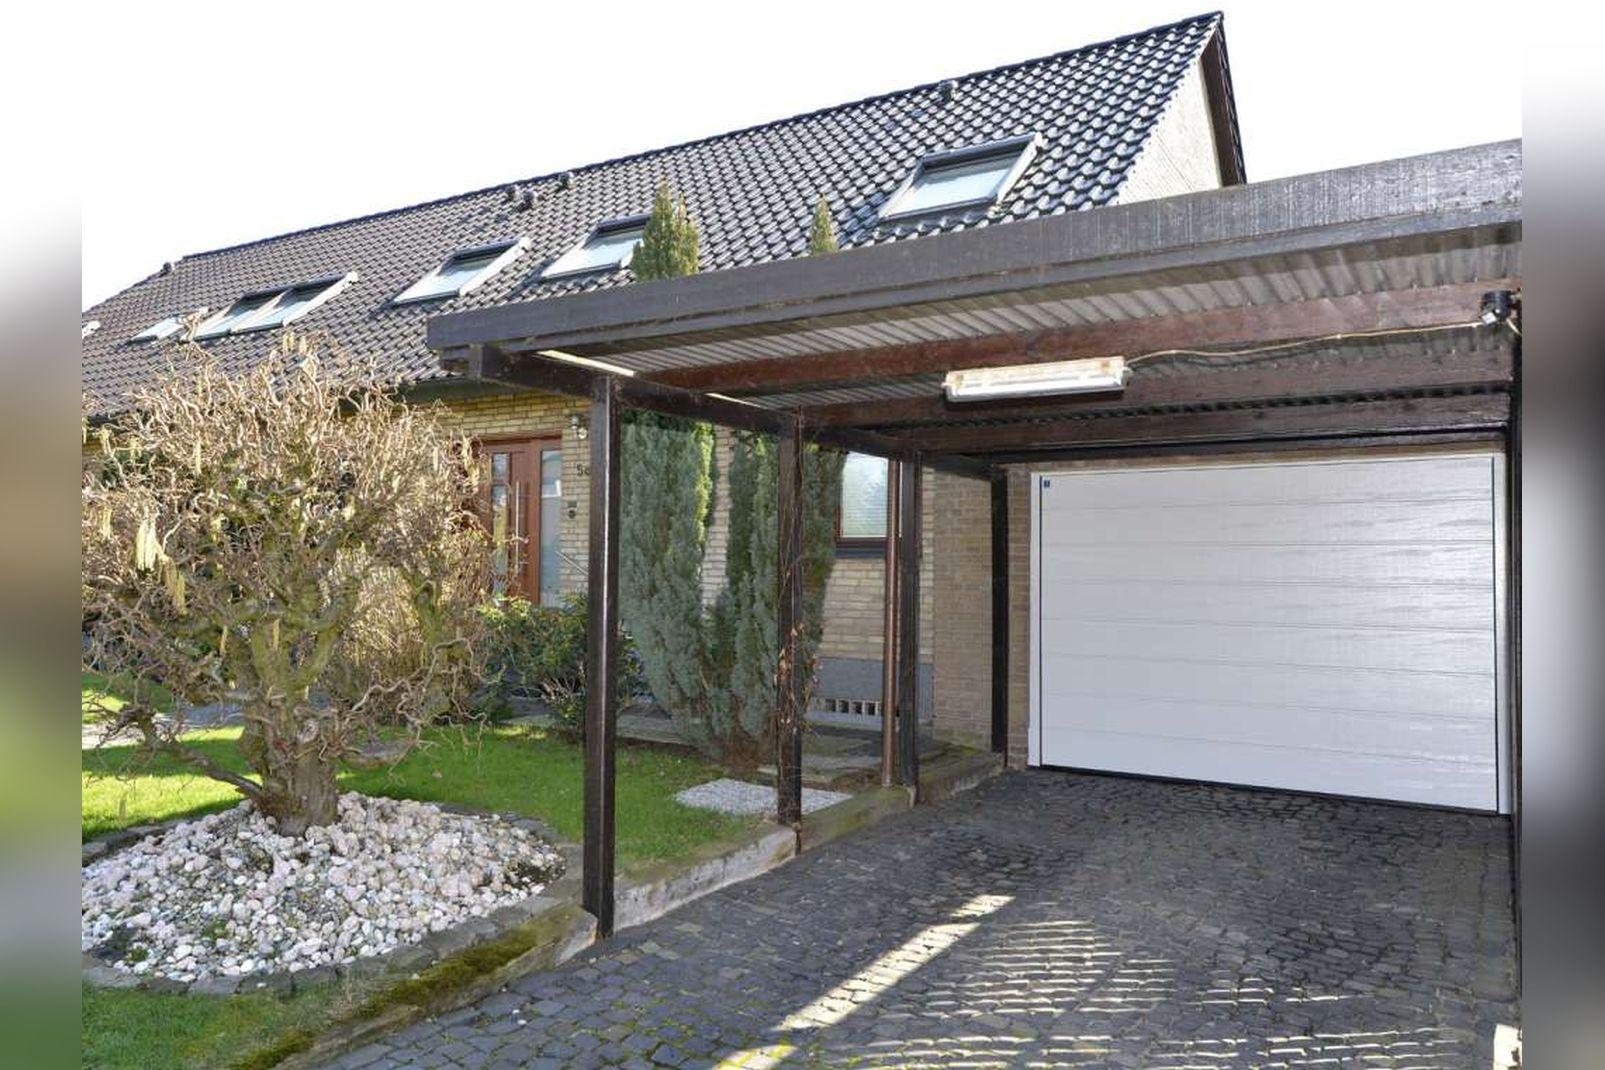 Immobilie Nr.0254 - Doppelhaushälfte rechtsbündig mit Garage & Carport  - Bild 2.jpg